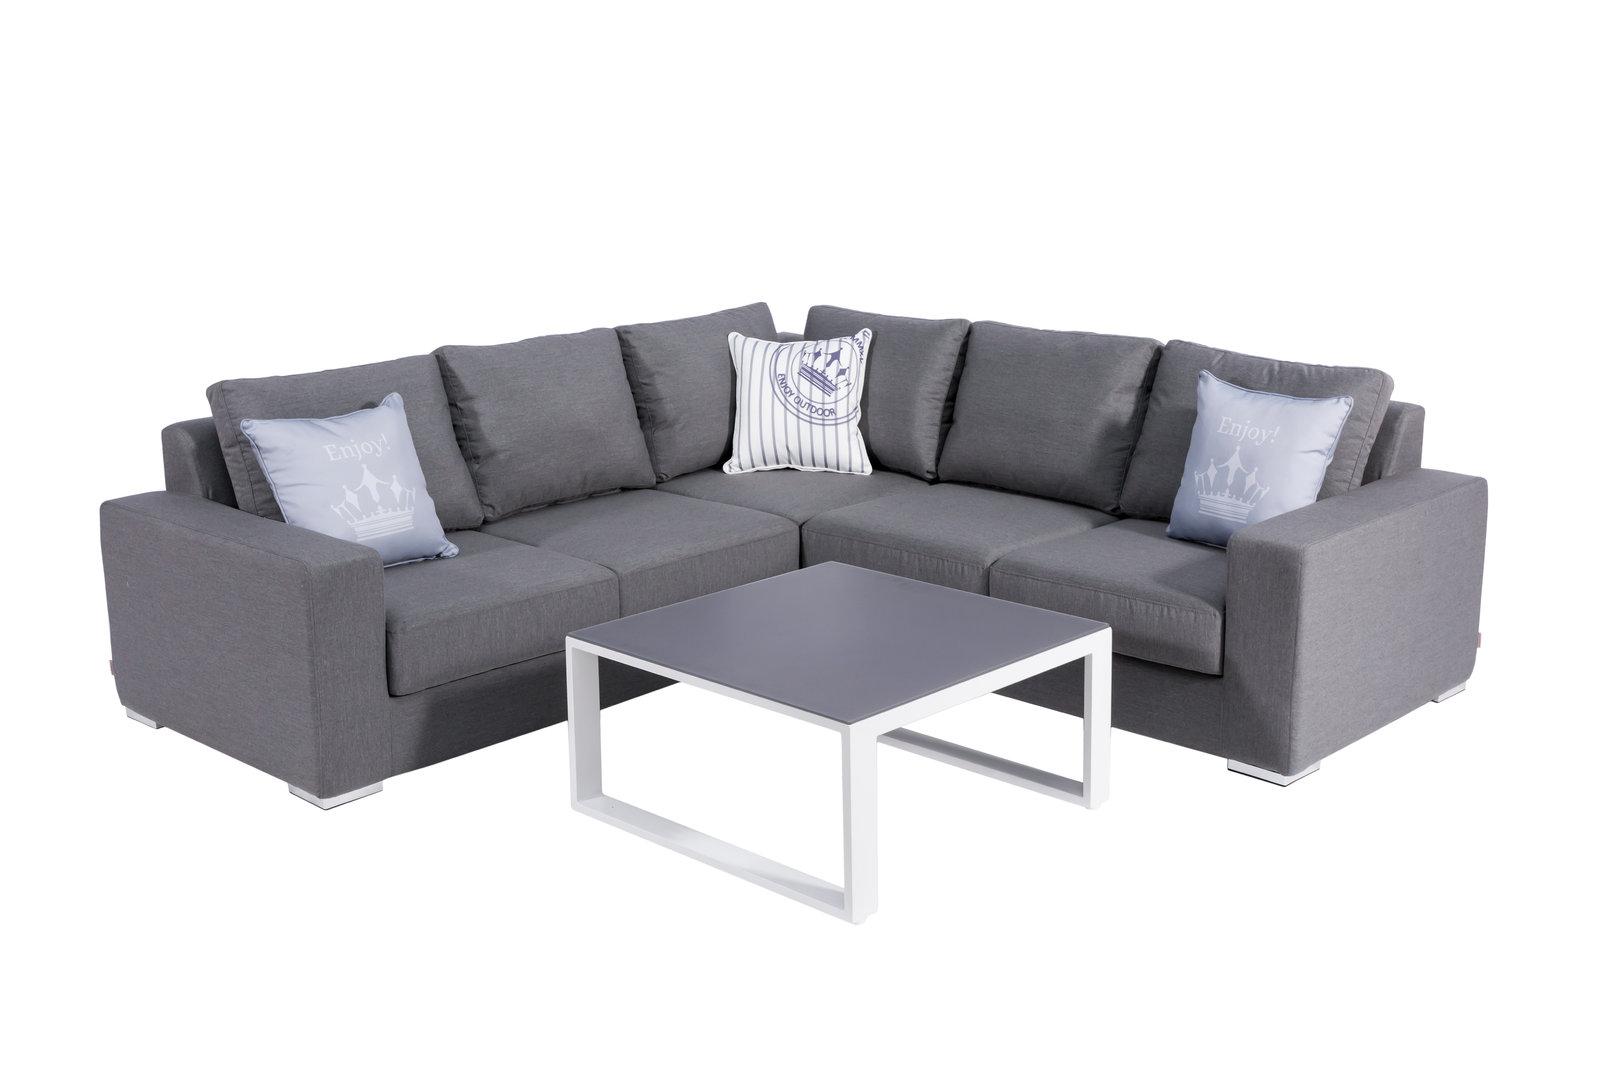 Full Size of Outdoor Sofa Wetterfest Ikea Couch Lounge Ecklounge Samo Mit Originalem Sunbrella Stoff Garnitur 2 Teilig Schlafsofa Liegefläche 160x200 180x200 Altes 3 Wohnzimmer Outdoor Sofa Wetterfest